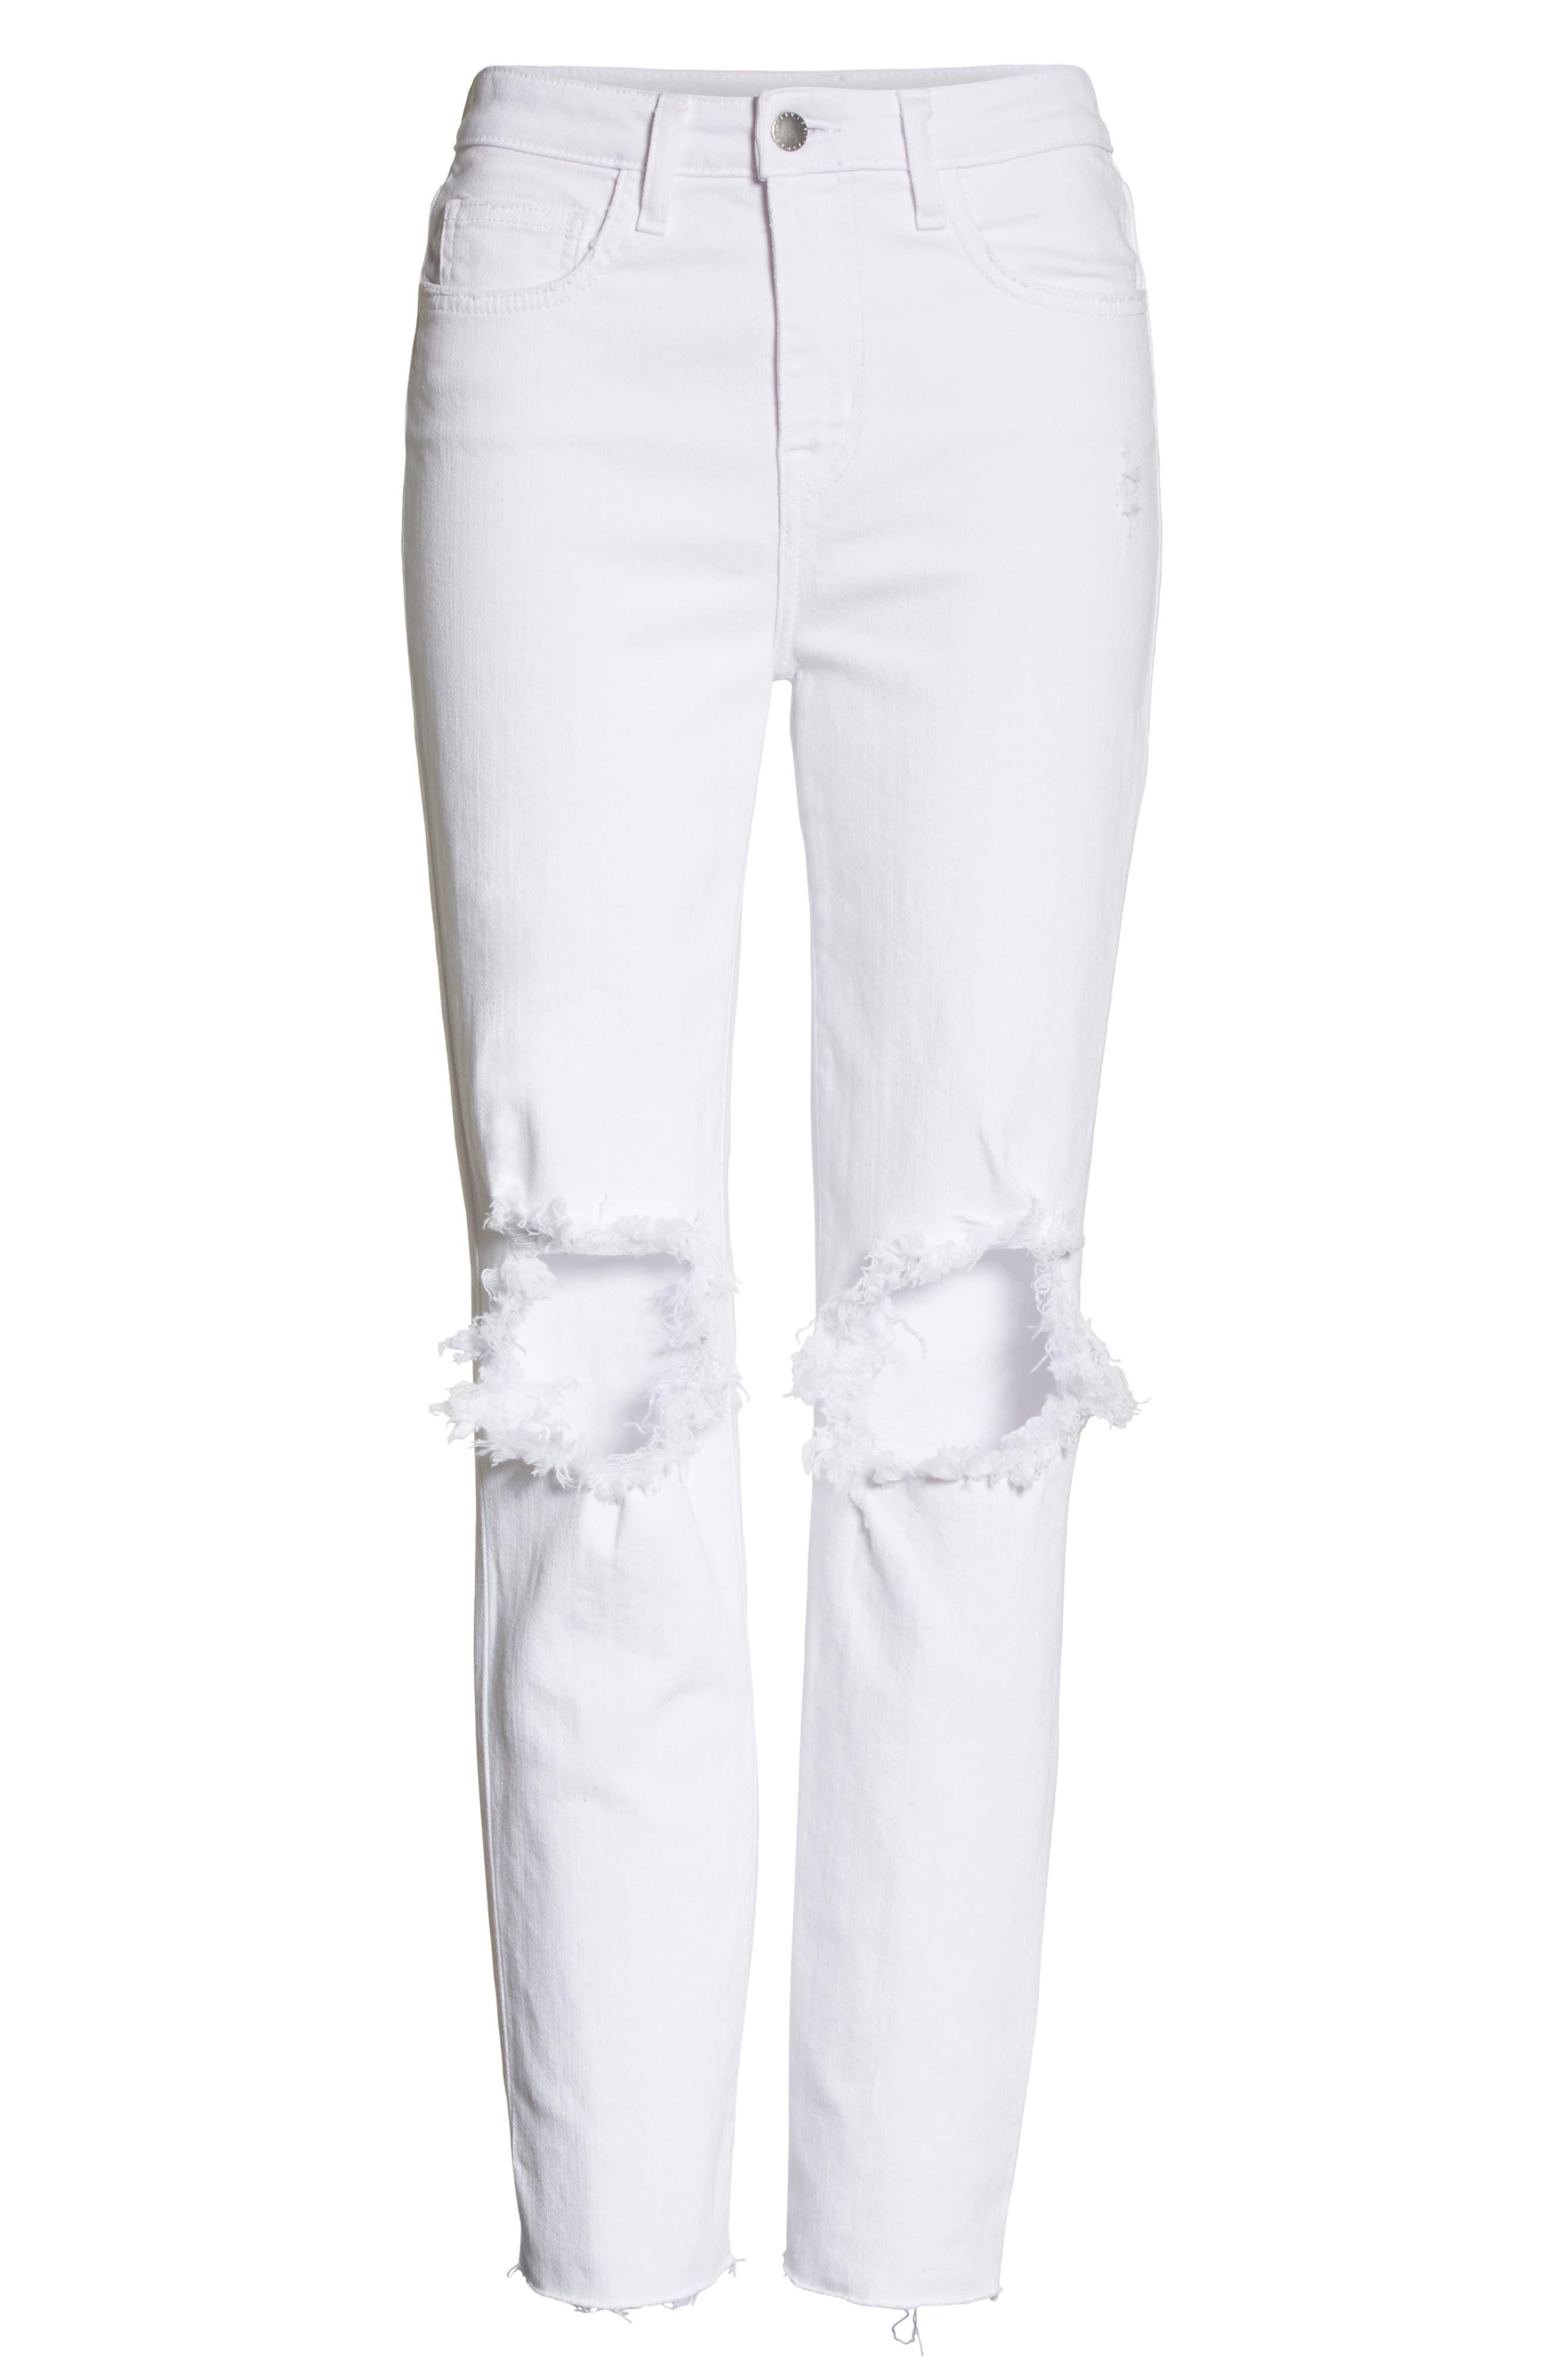 Audrina Ripped Straight Leg Crop Jeans,                             Alternate thumbnail 6, color,                             BLANC WORN DESTRUCT